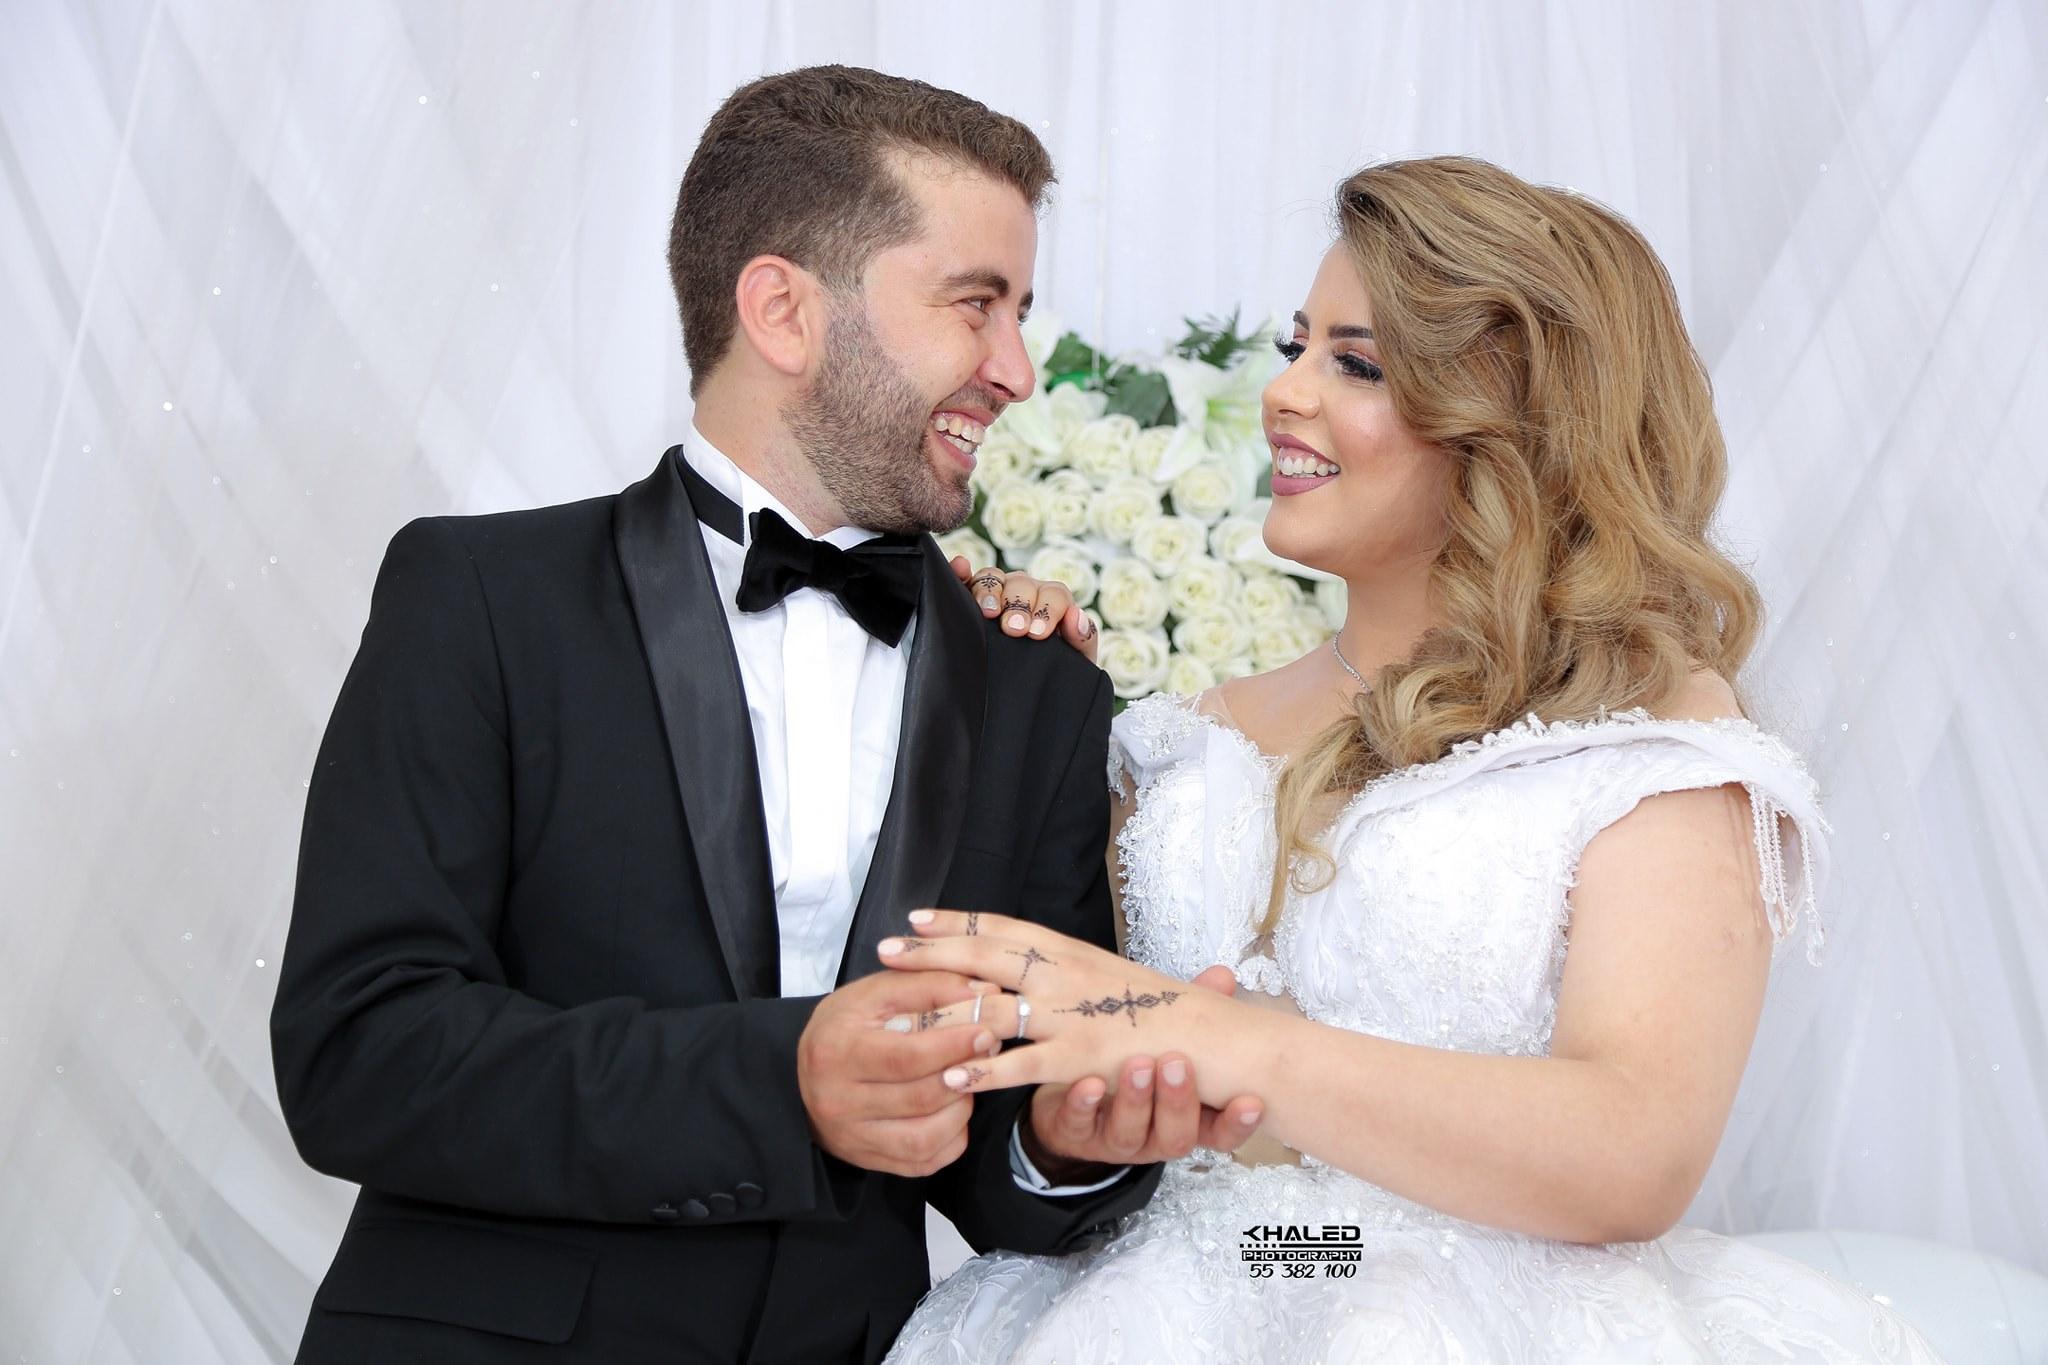 fida9_plus_belles_mariées_tunisiennes_186_2019